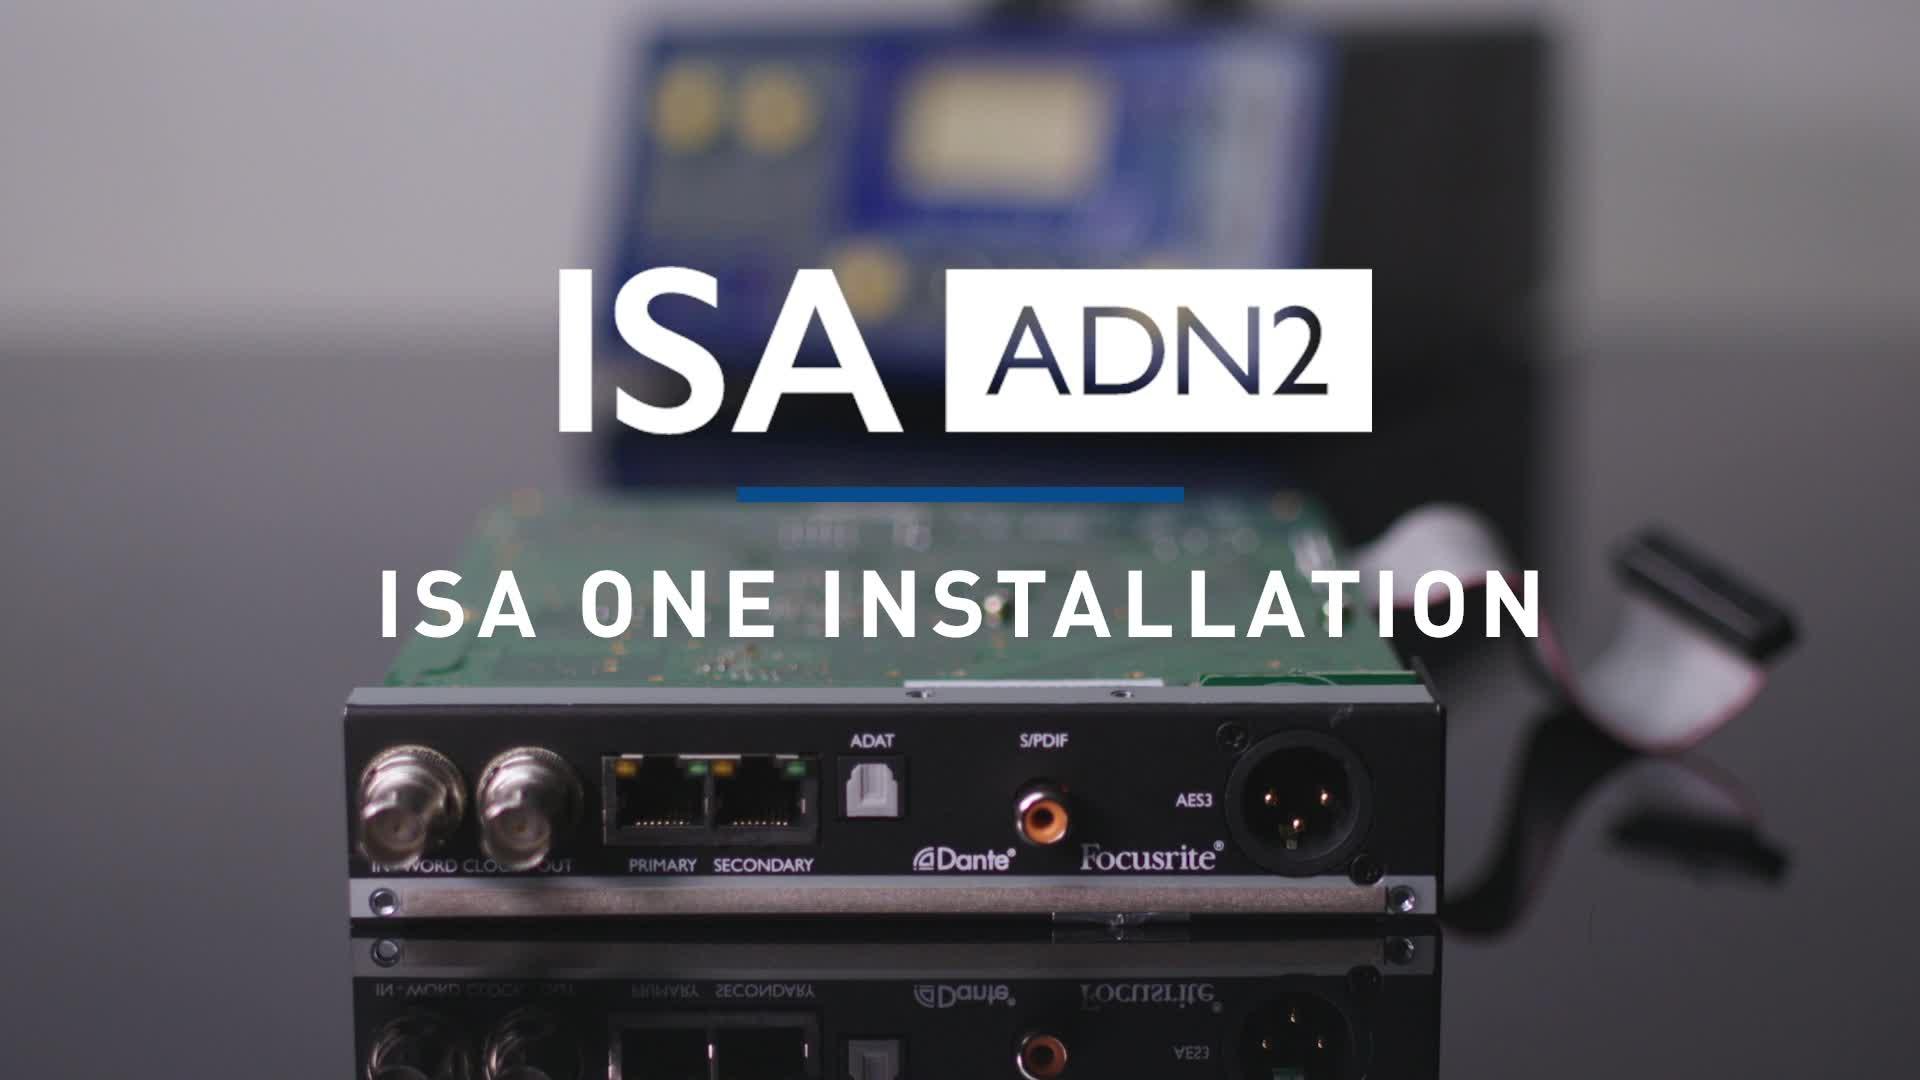 Focusrite - ISA ONE ADN2 Card Installation